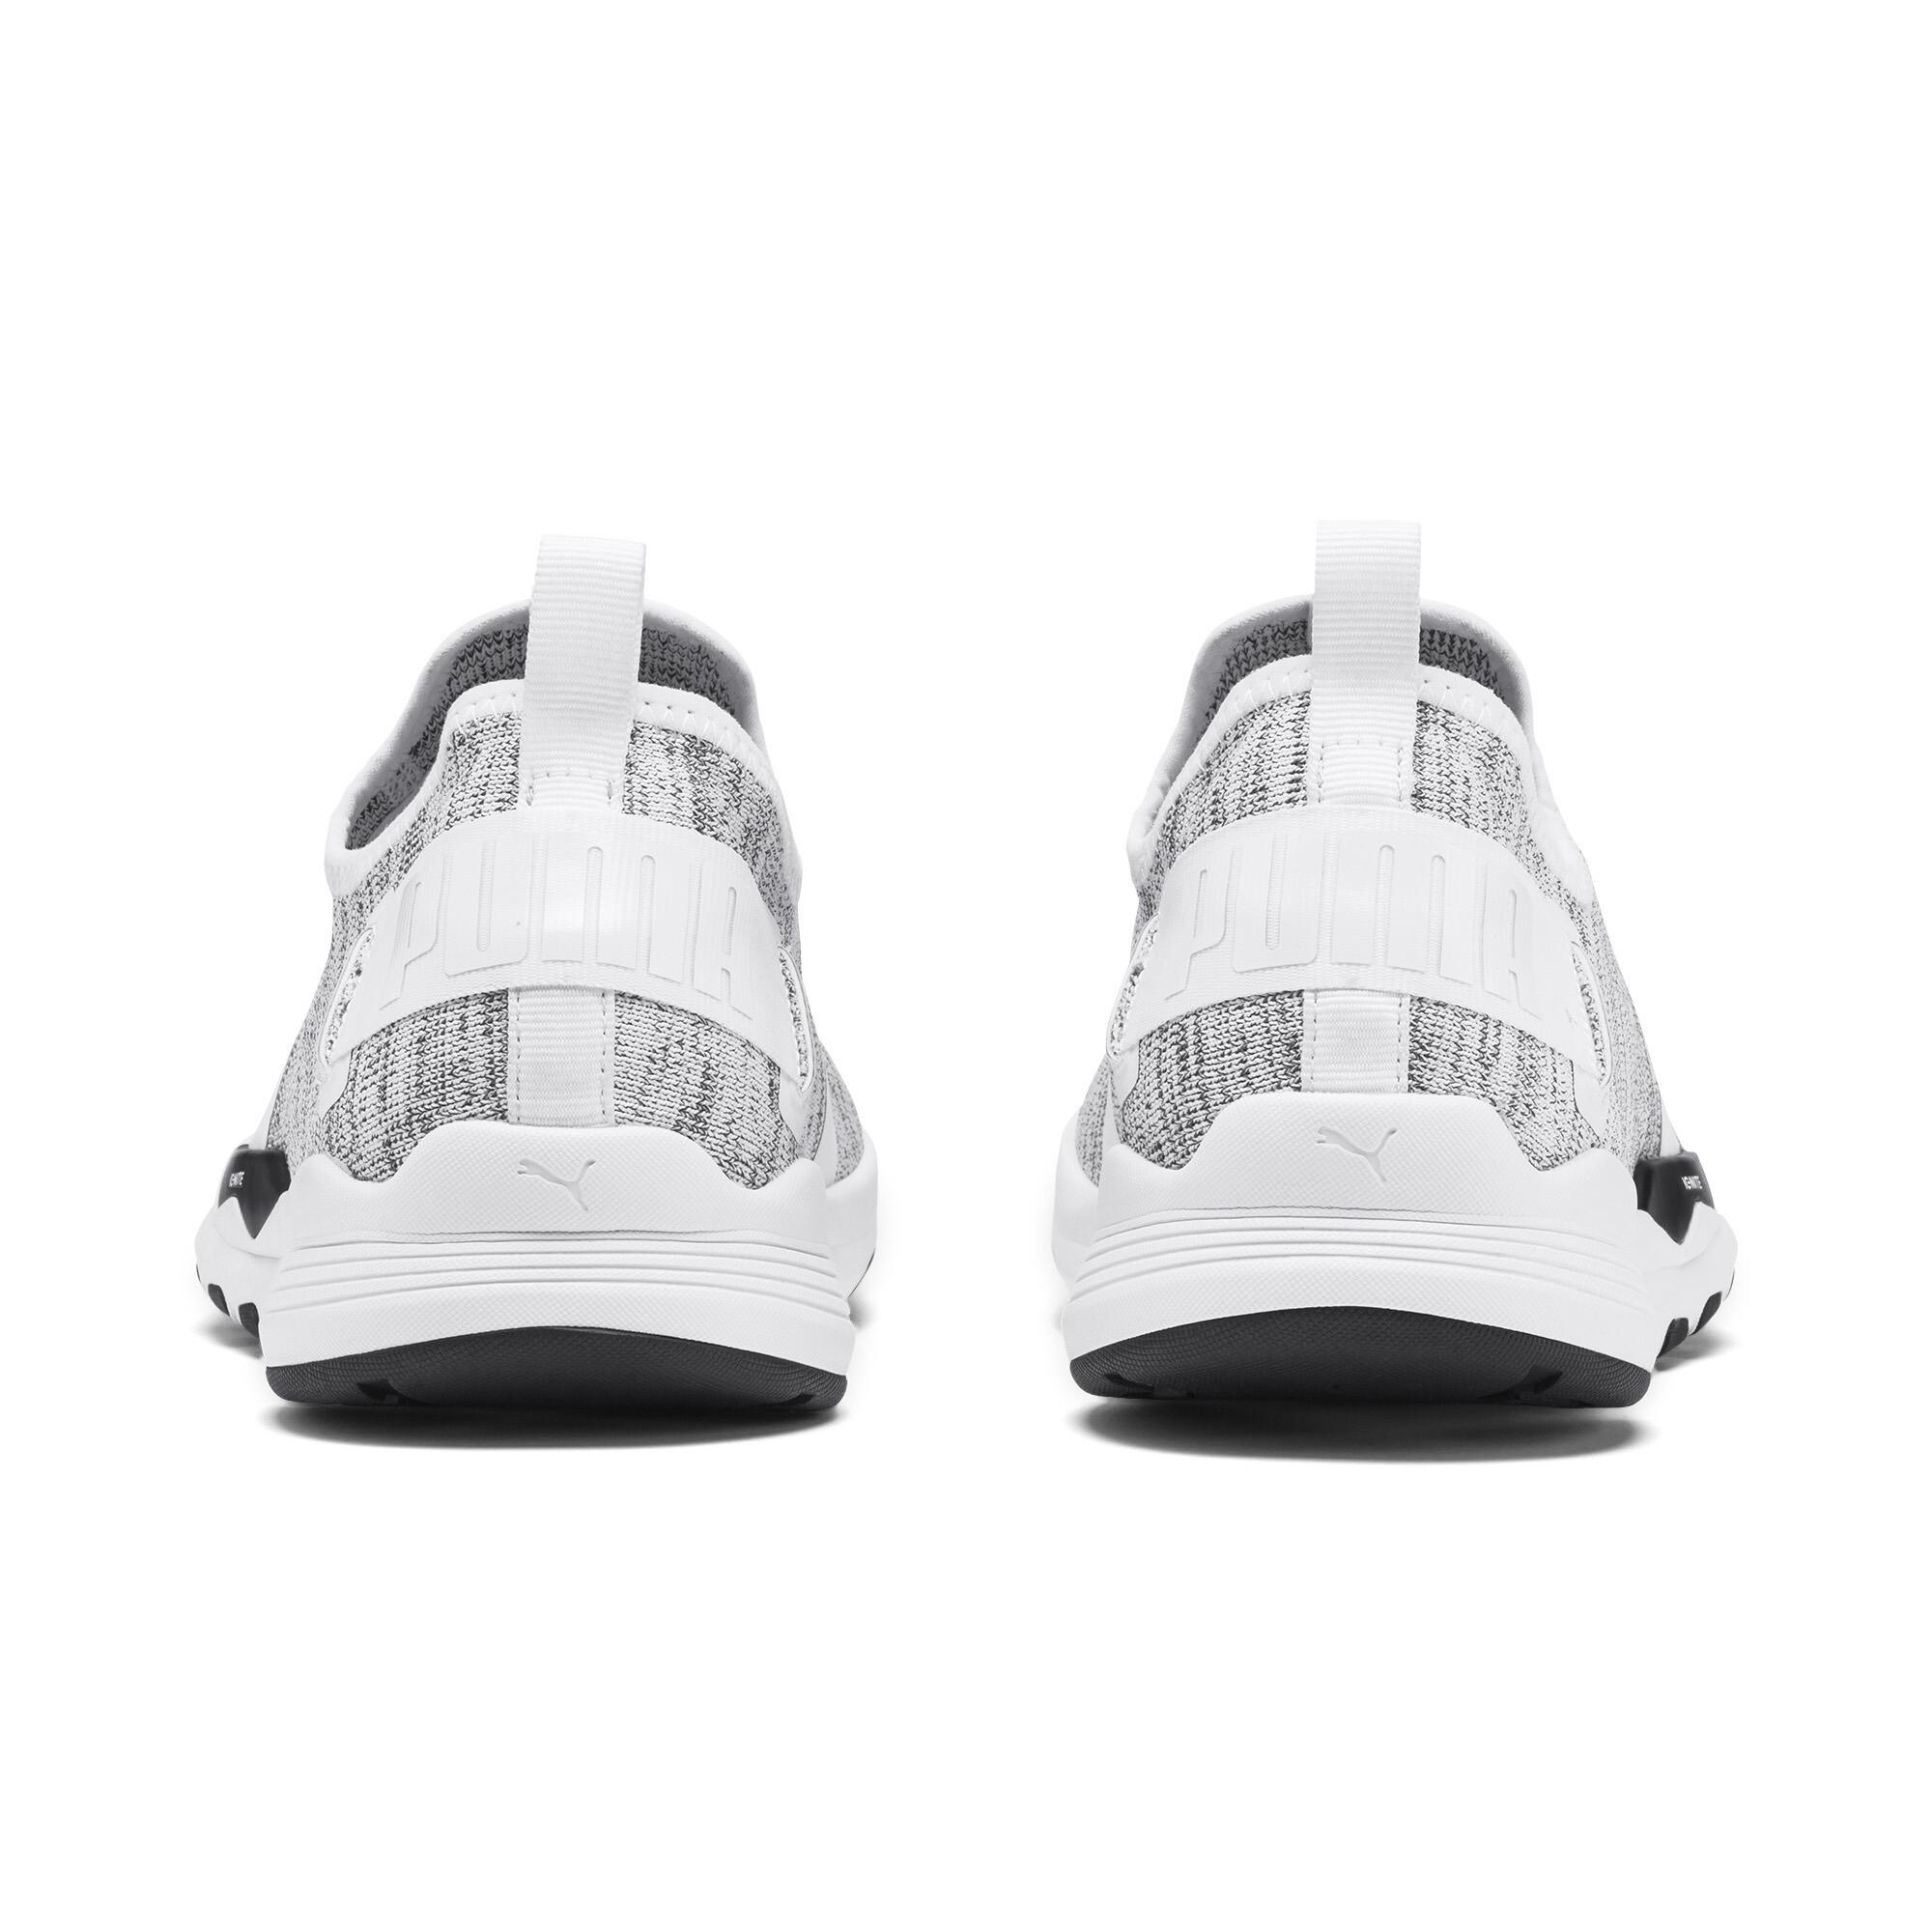 PUMA-Men-039-s-IGNITE-Contender-Knit-Running-Shoes thumbnail 20